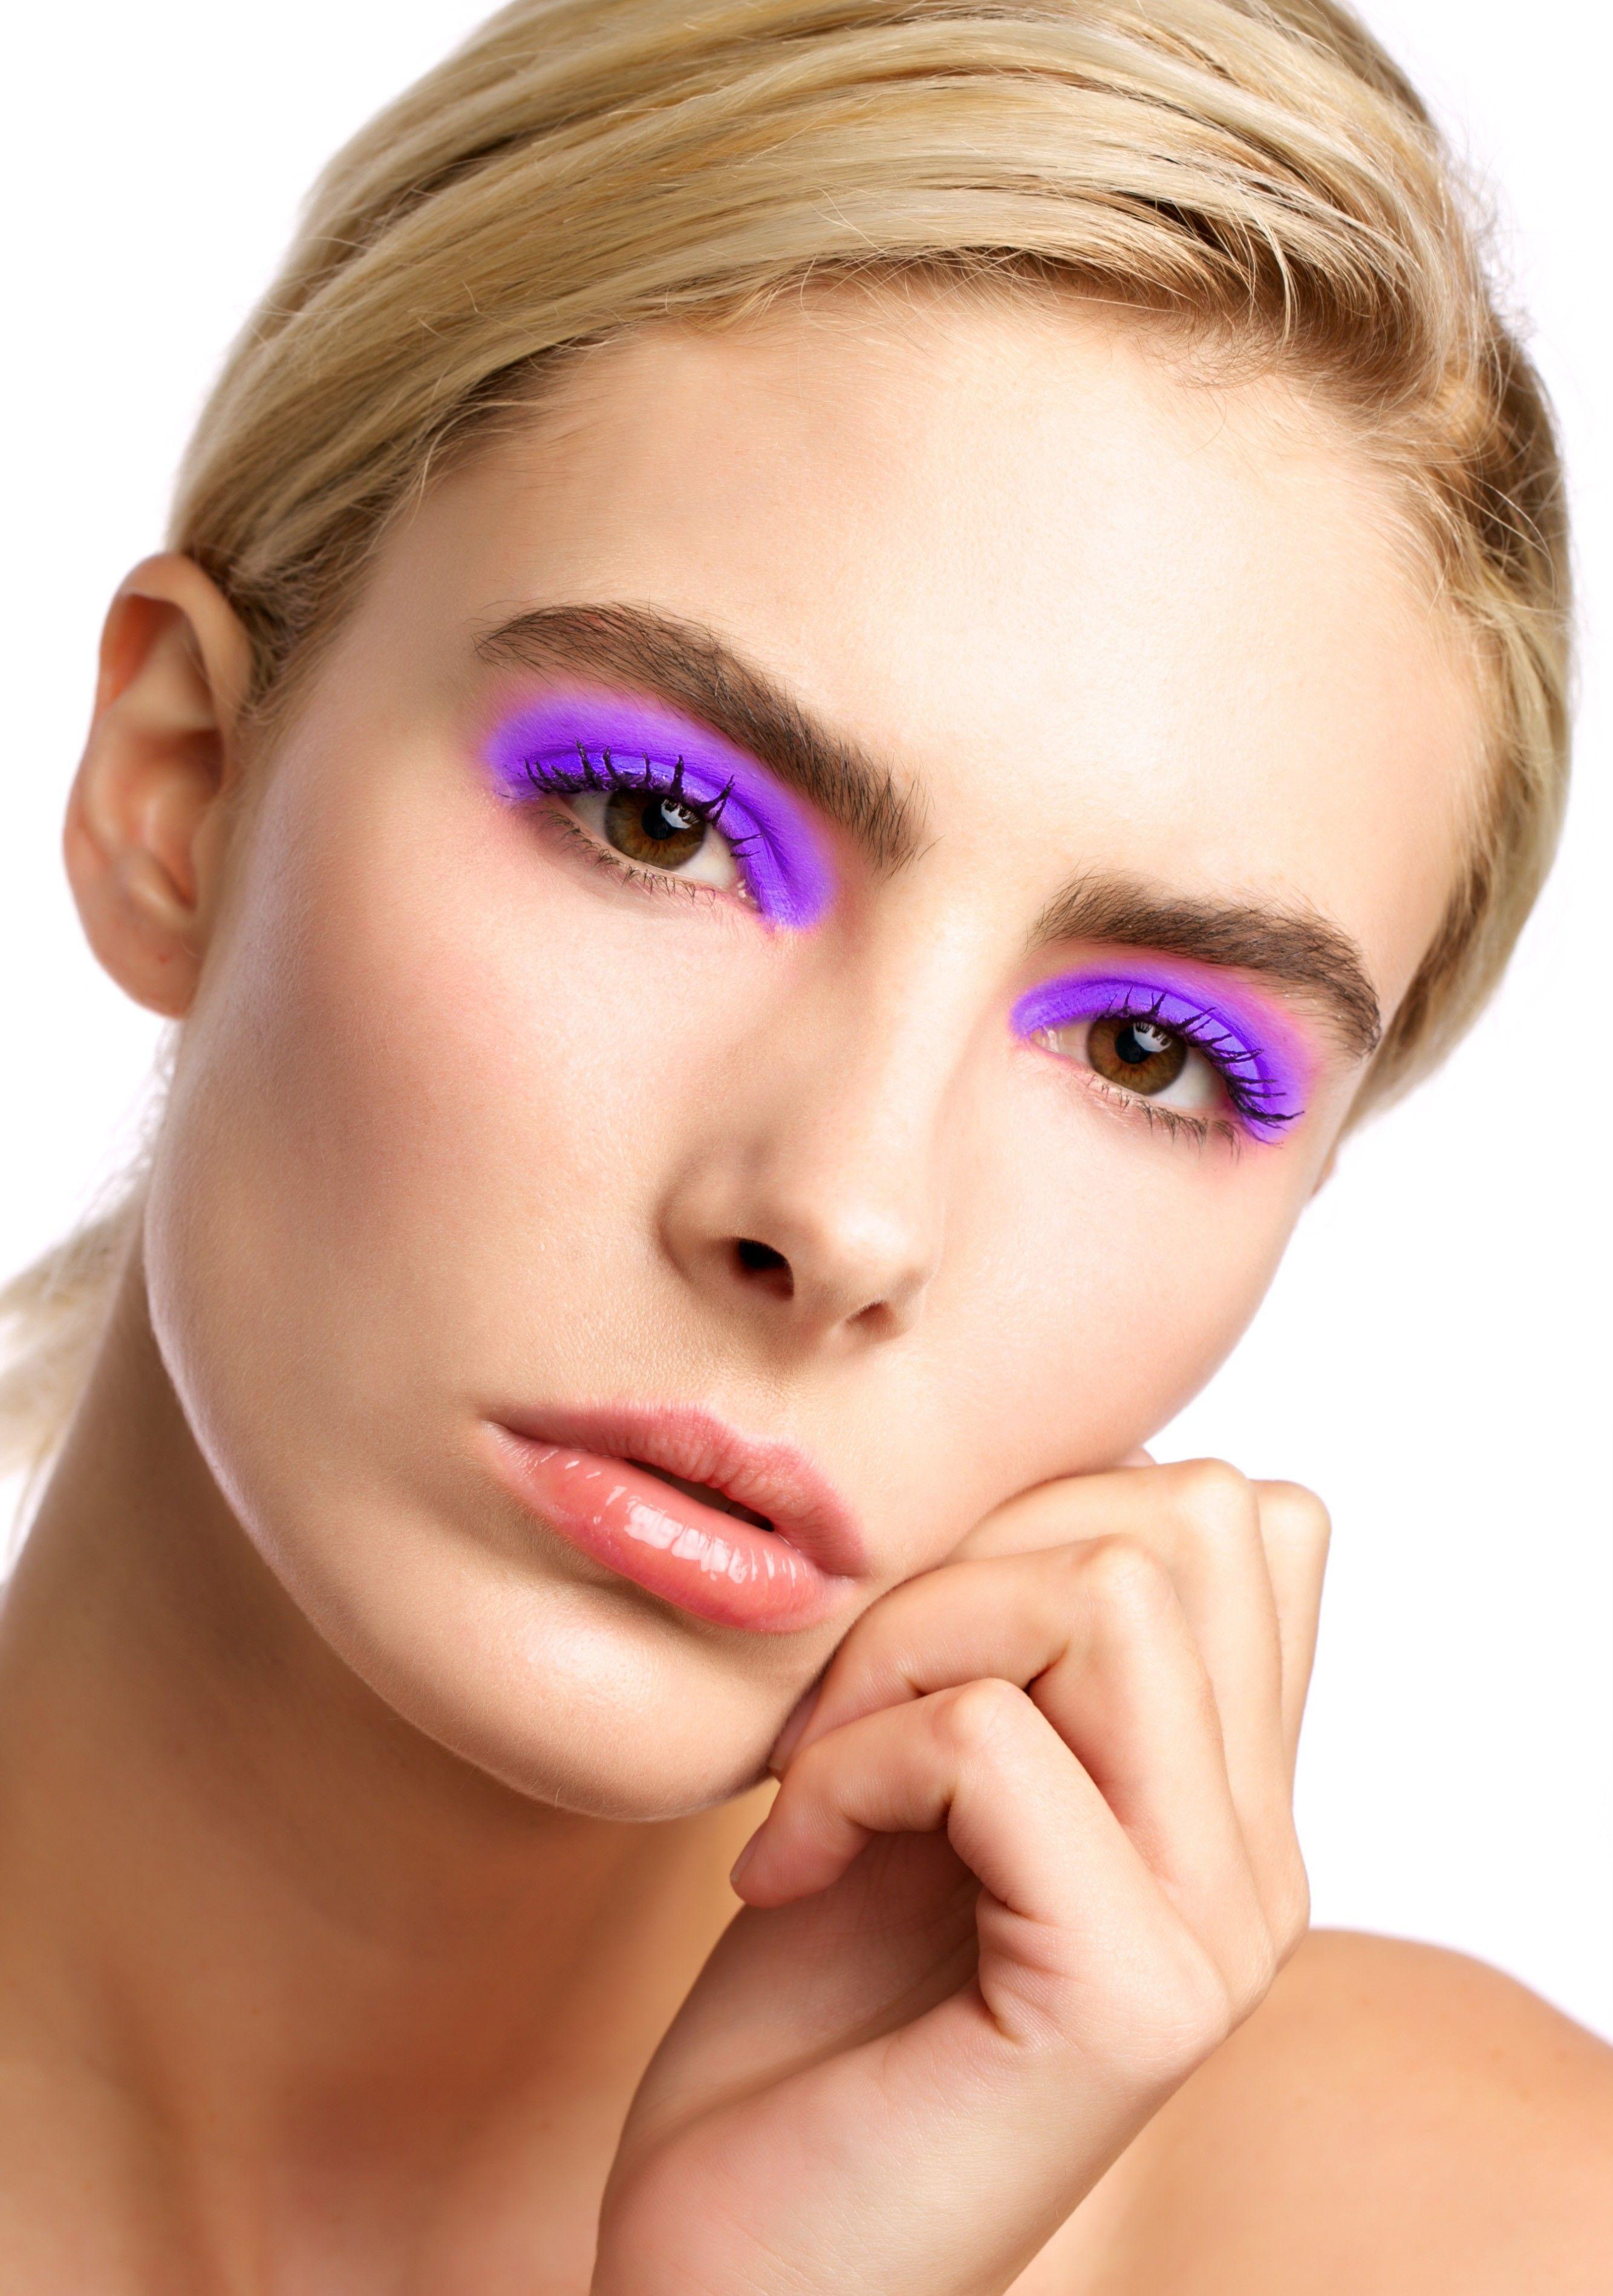 Stargazer Radiate UV Neon Loose Eyeshadow Makeup